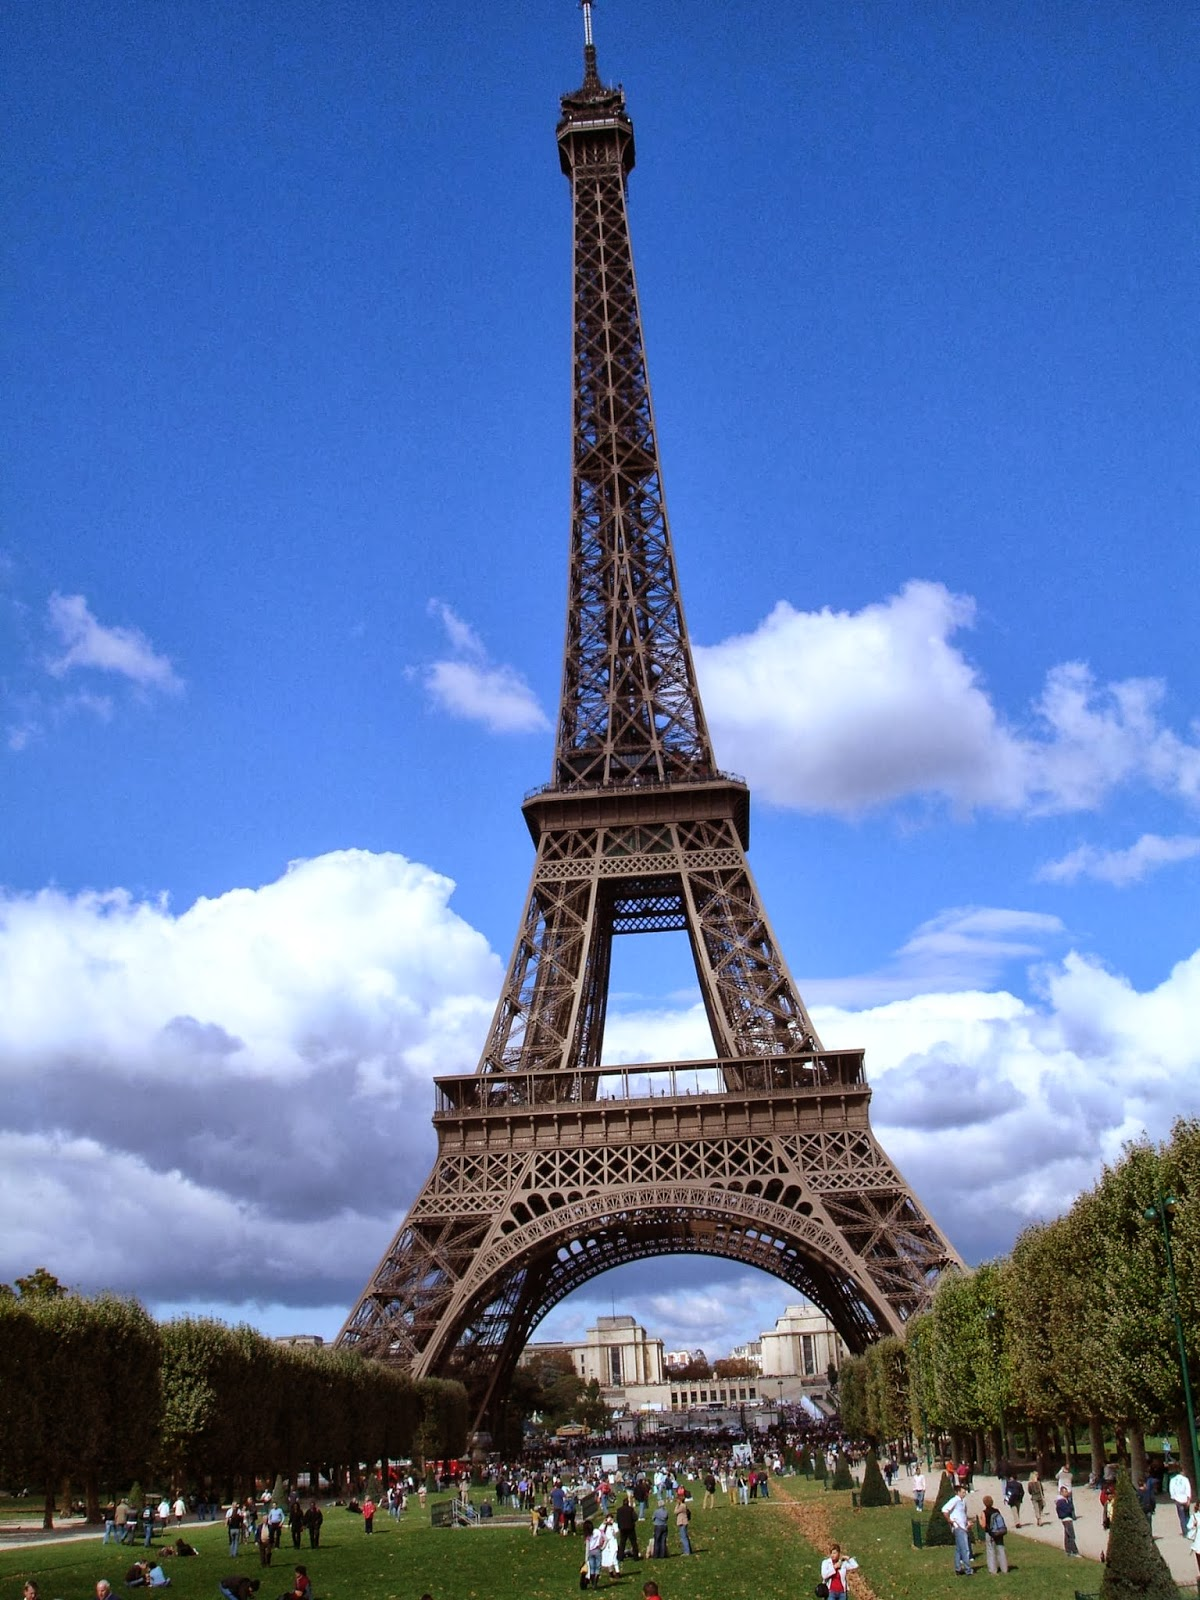 Best flower photos tumblr cute flower pictures download hd flower - Cute Eiffel Tower Wallpapers Wallpapersafari